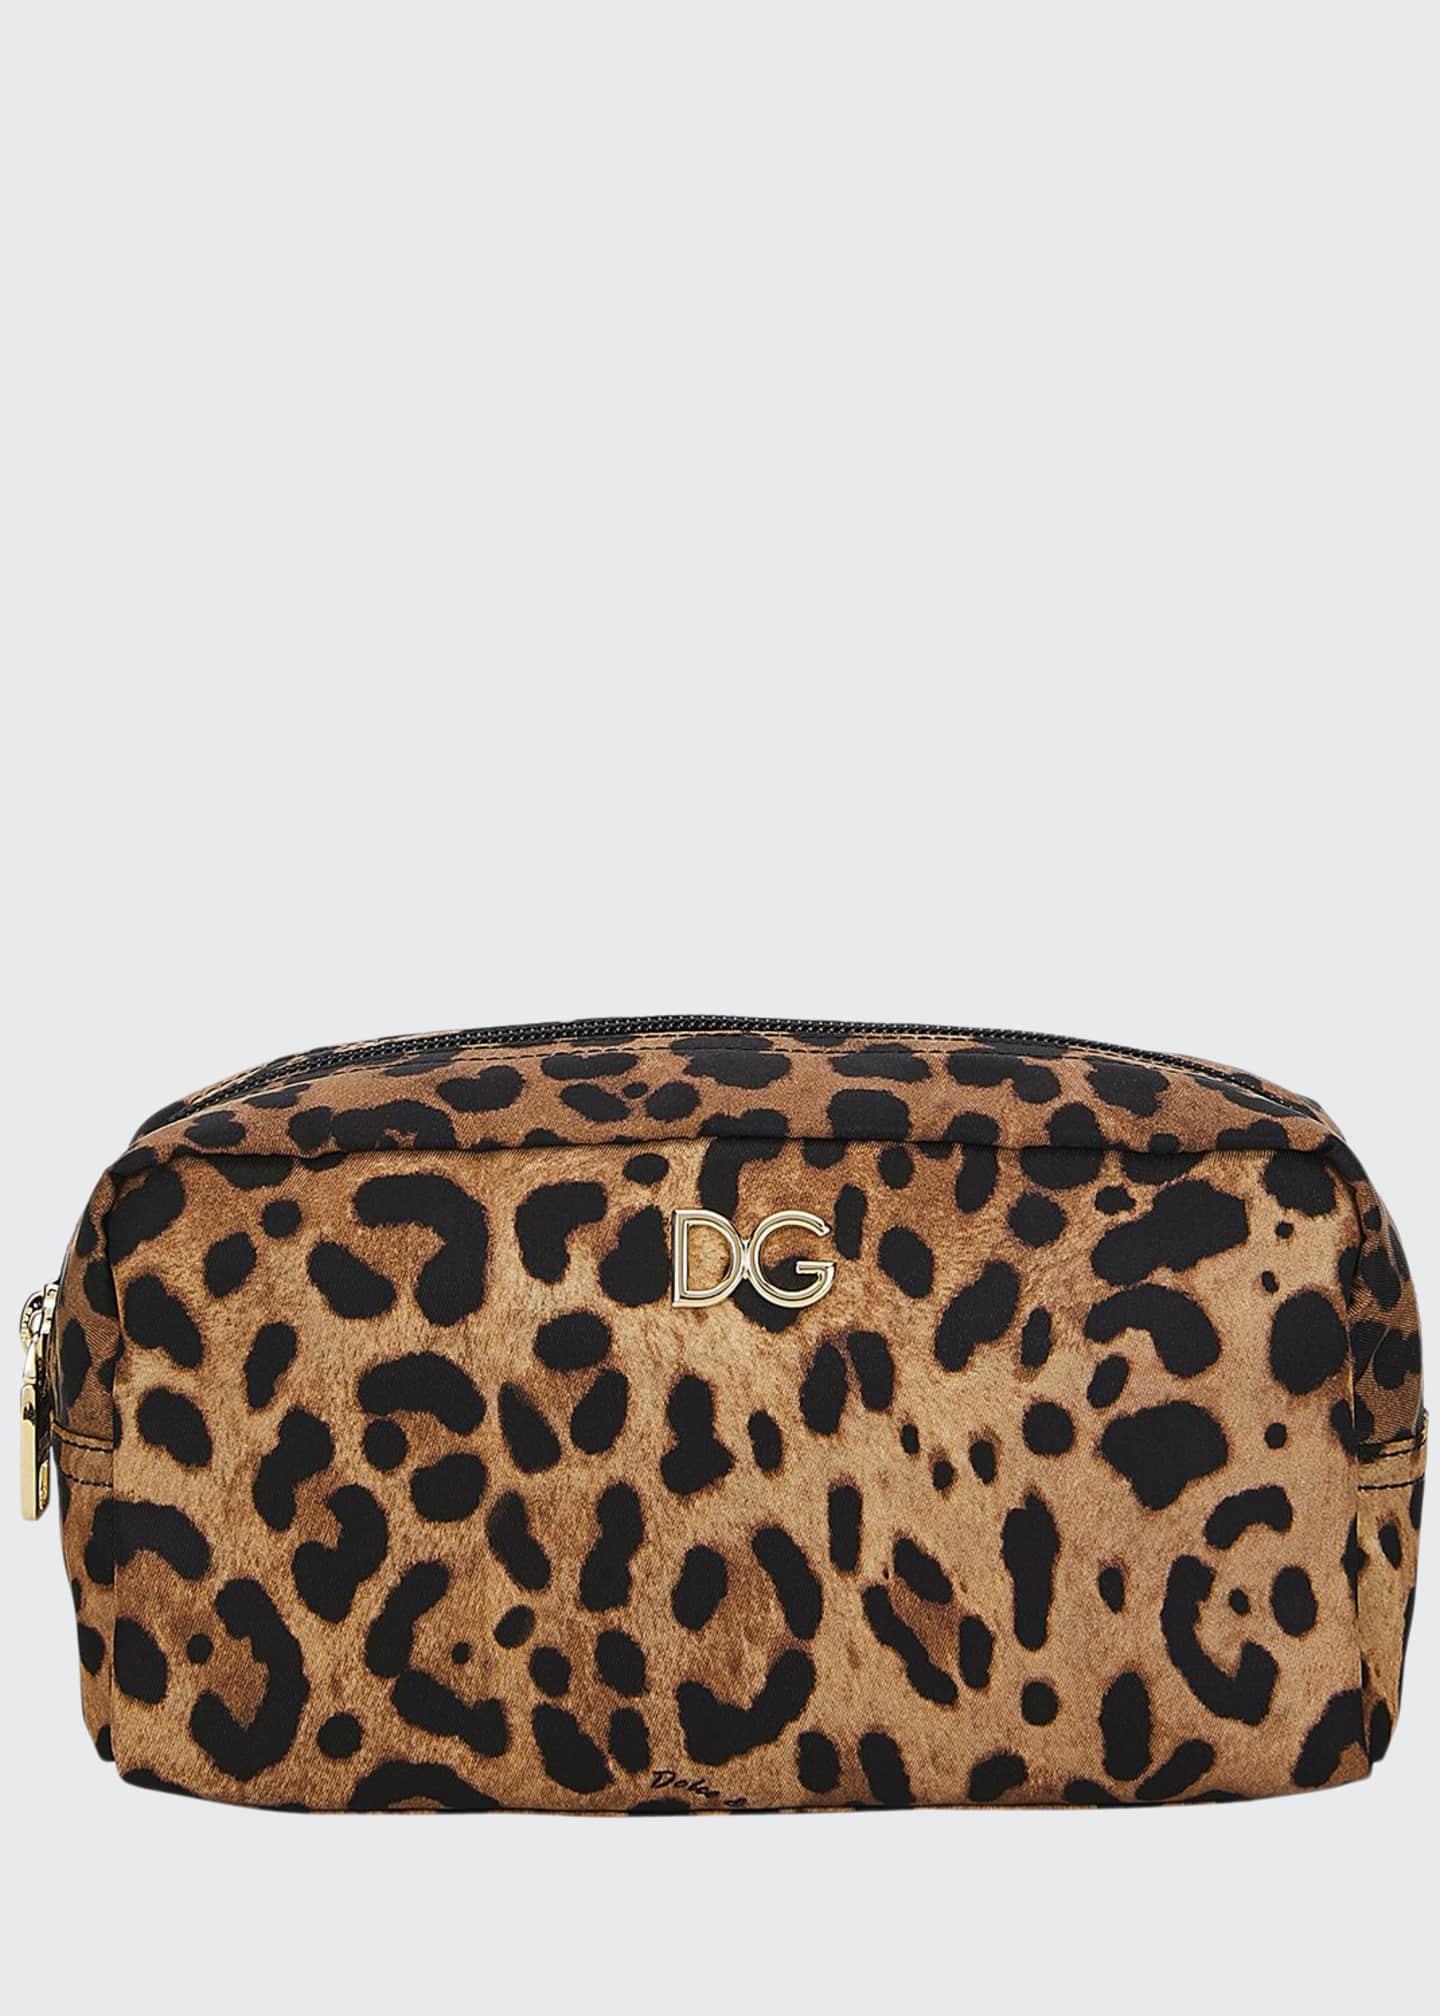 Dolce & Gabbana Leopard Nylon Cosmetics Pouch Bag